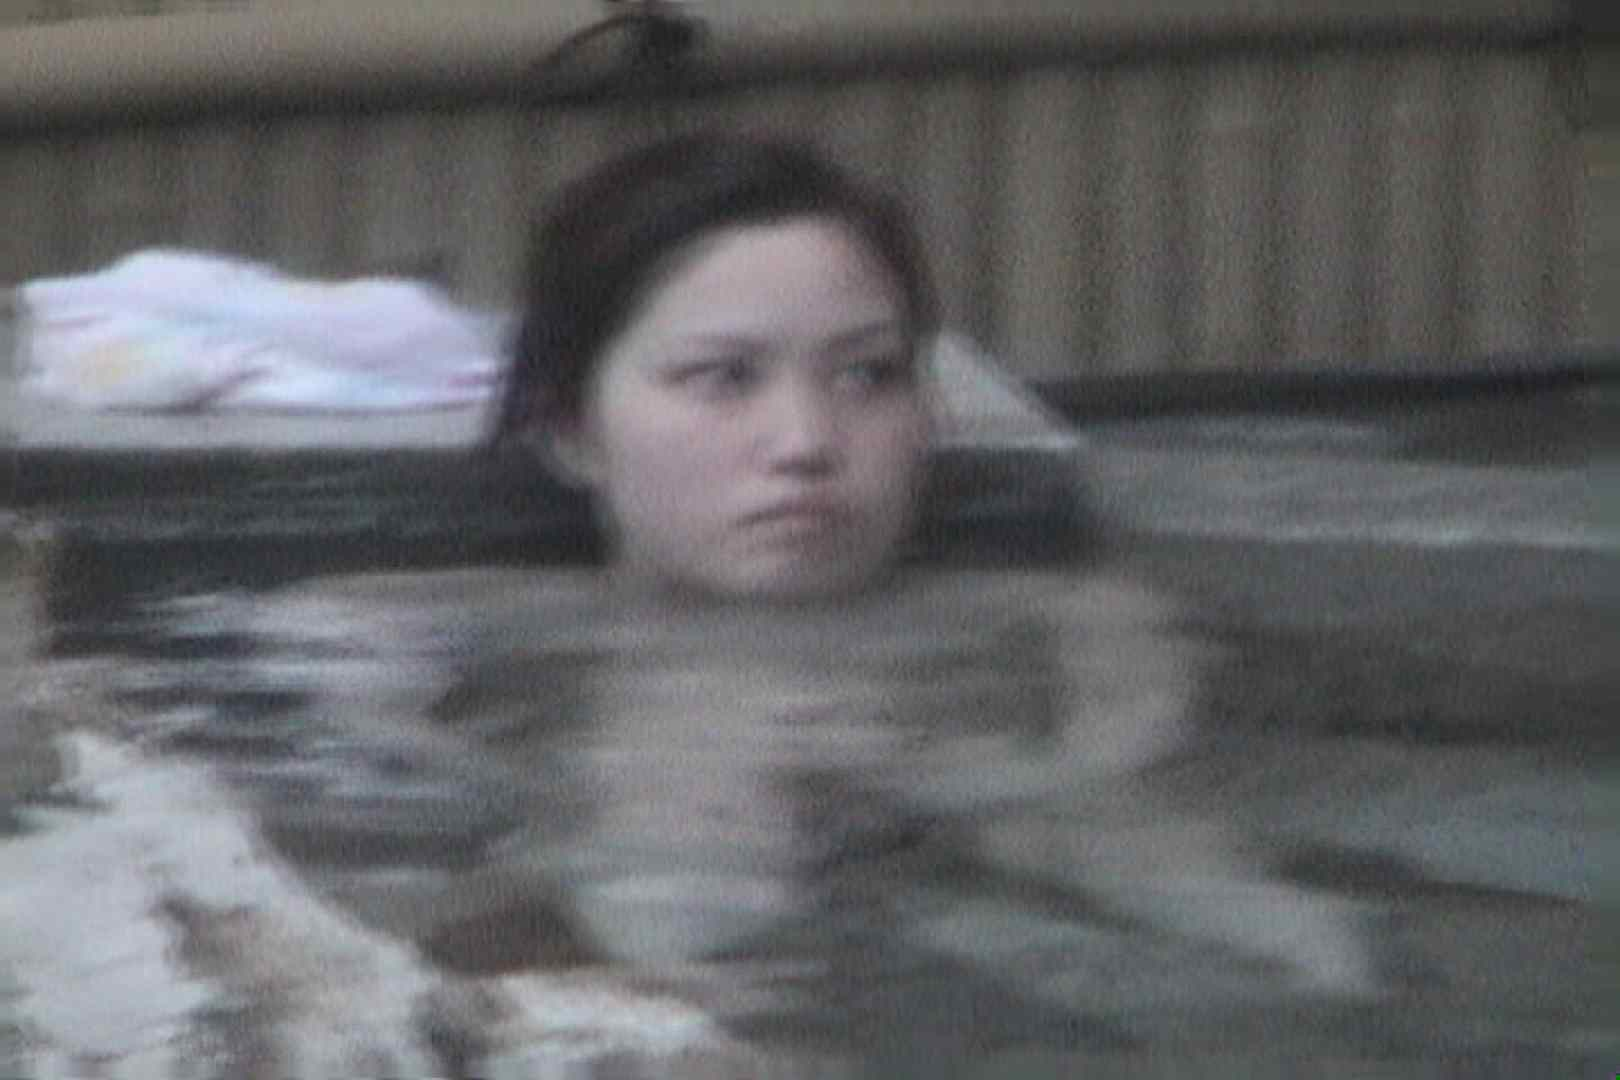 Aquaな露天風呂Vol.602 露天 のぞき動画キャプチャ 110pic 95